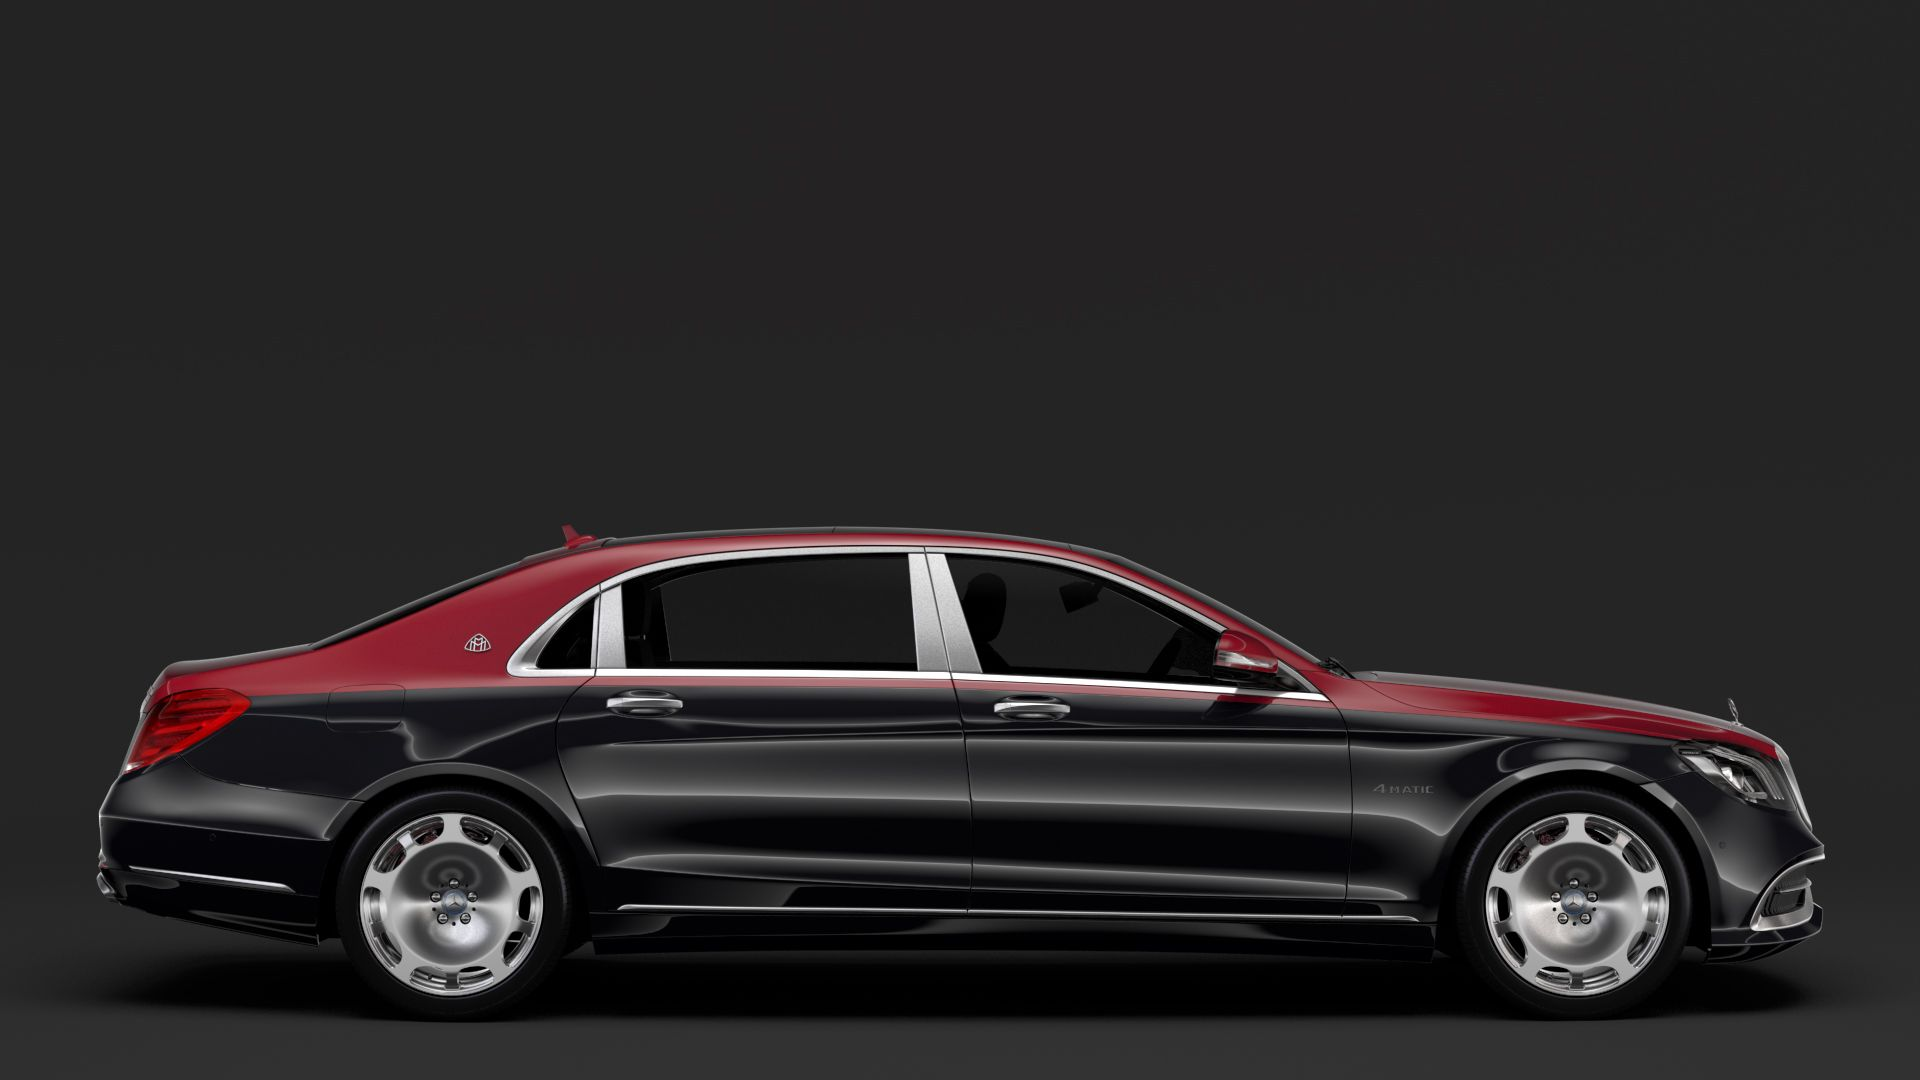 Mercedes Maybach S 560 4matic X222 2019 Mercedes Maybach